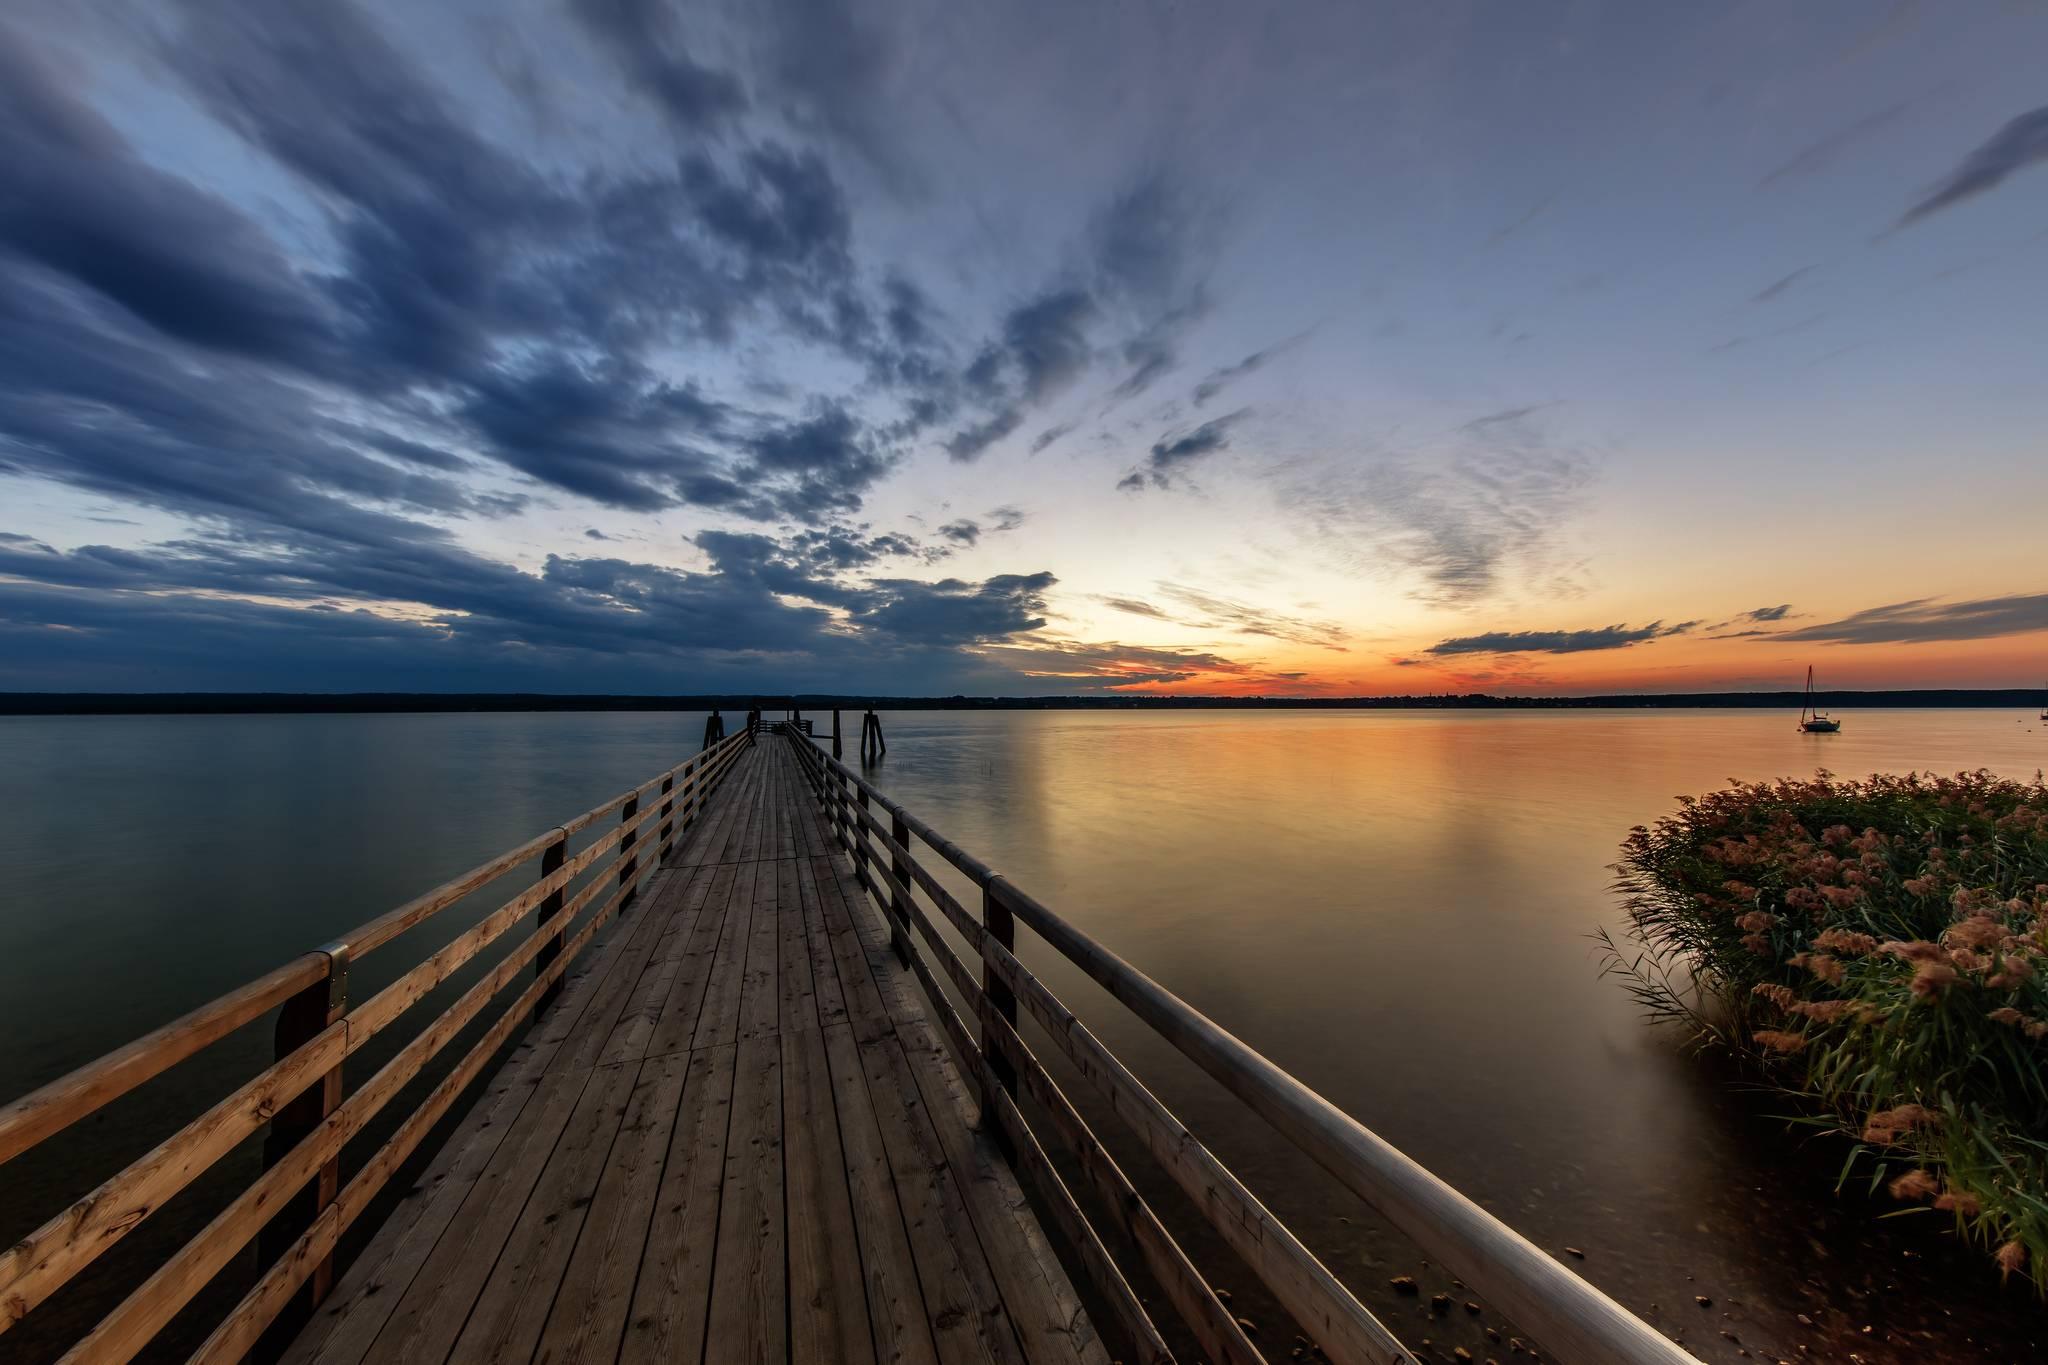 Lake Ammersee, Баварии, Германия